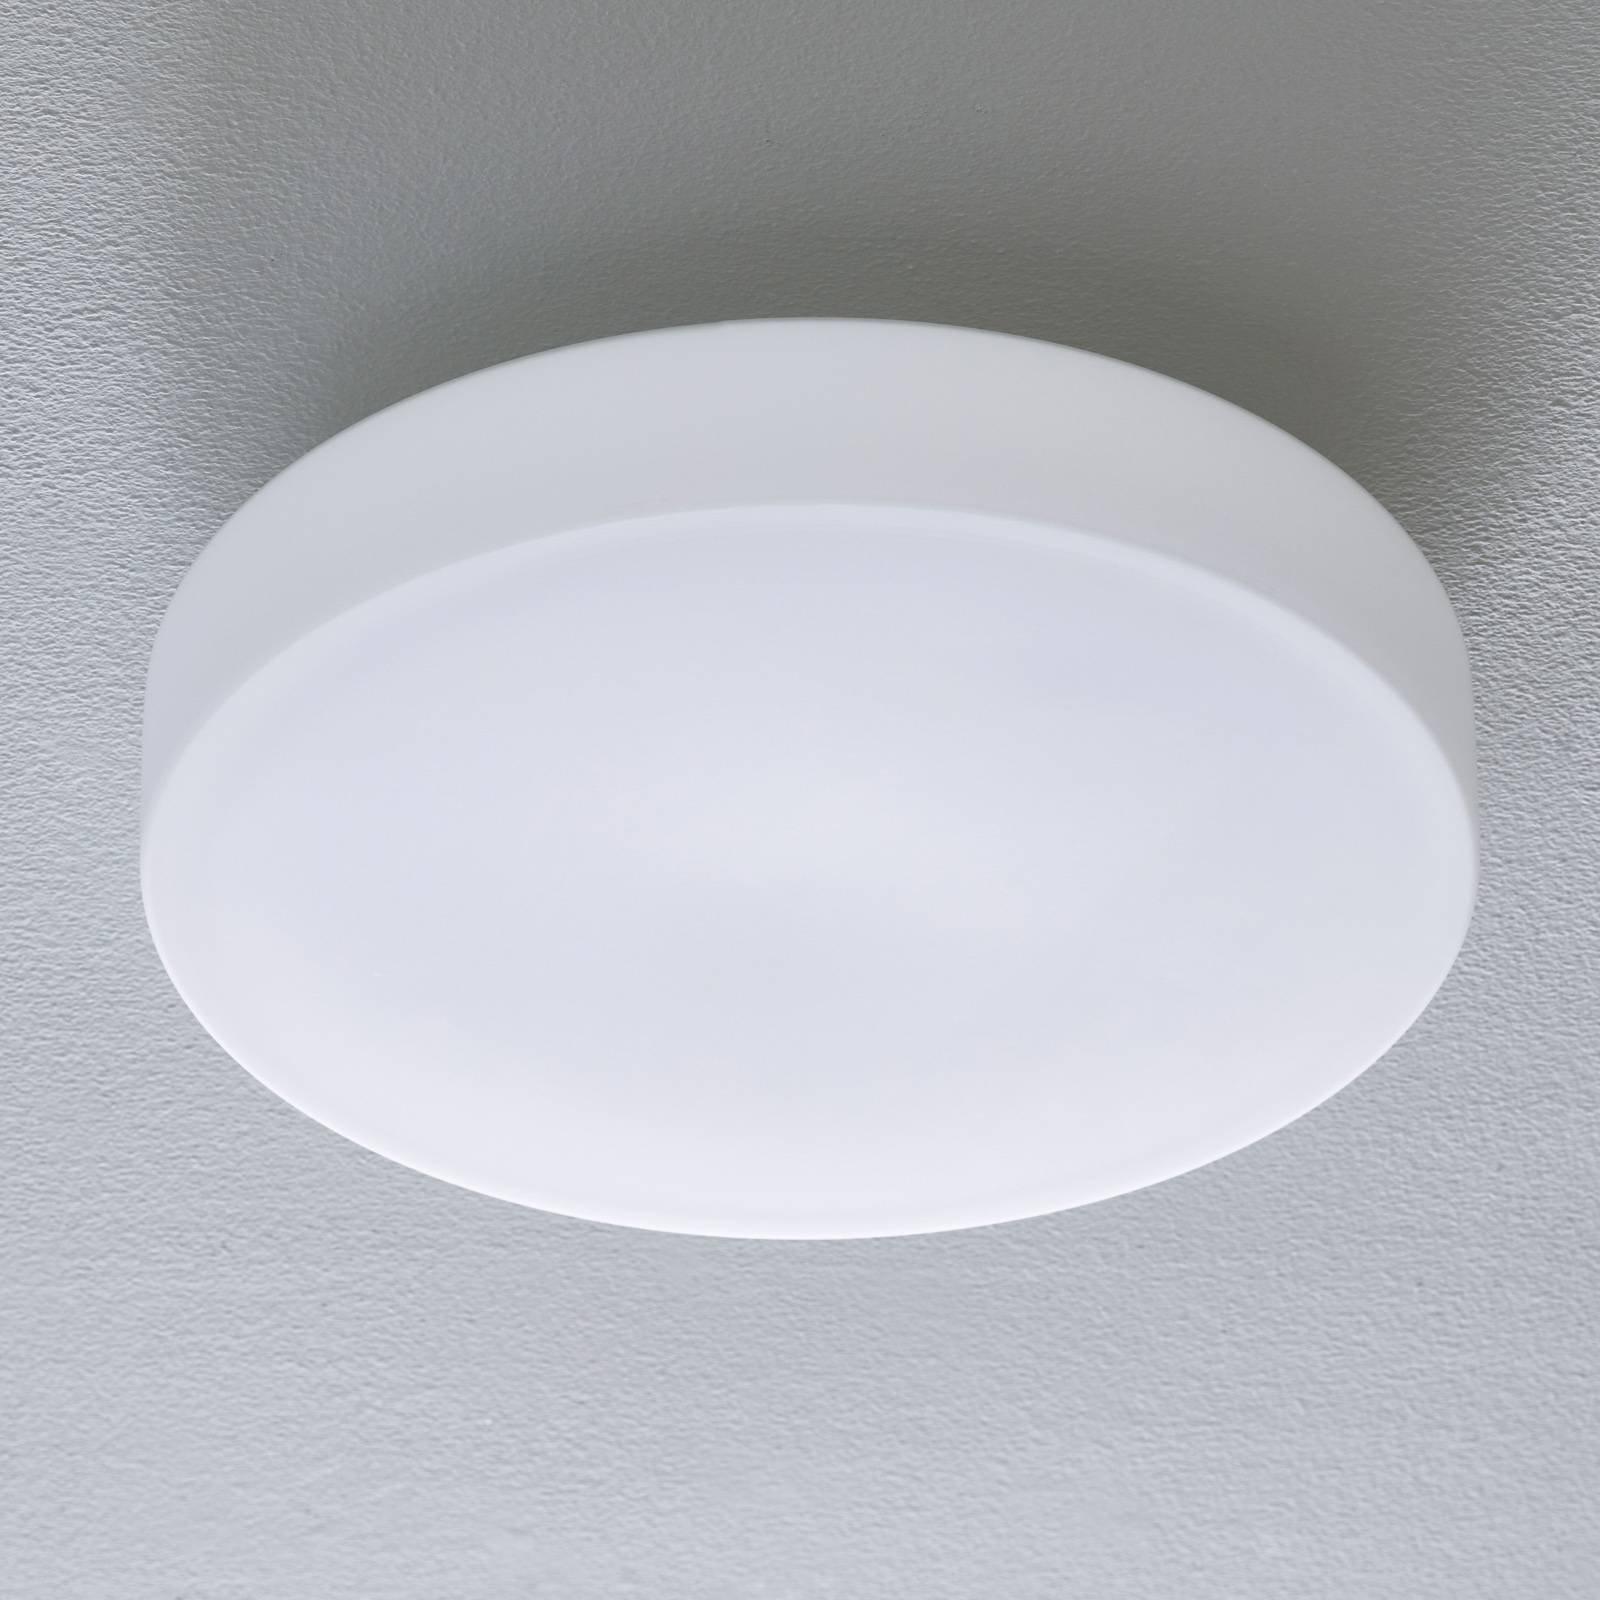 BEGA 50652 LED-taklampe opalglass 4 000 K Ø39cm